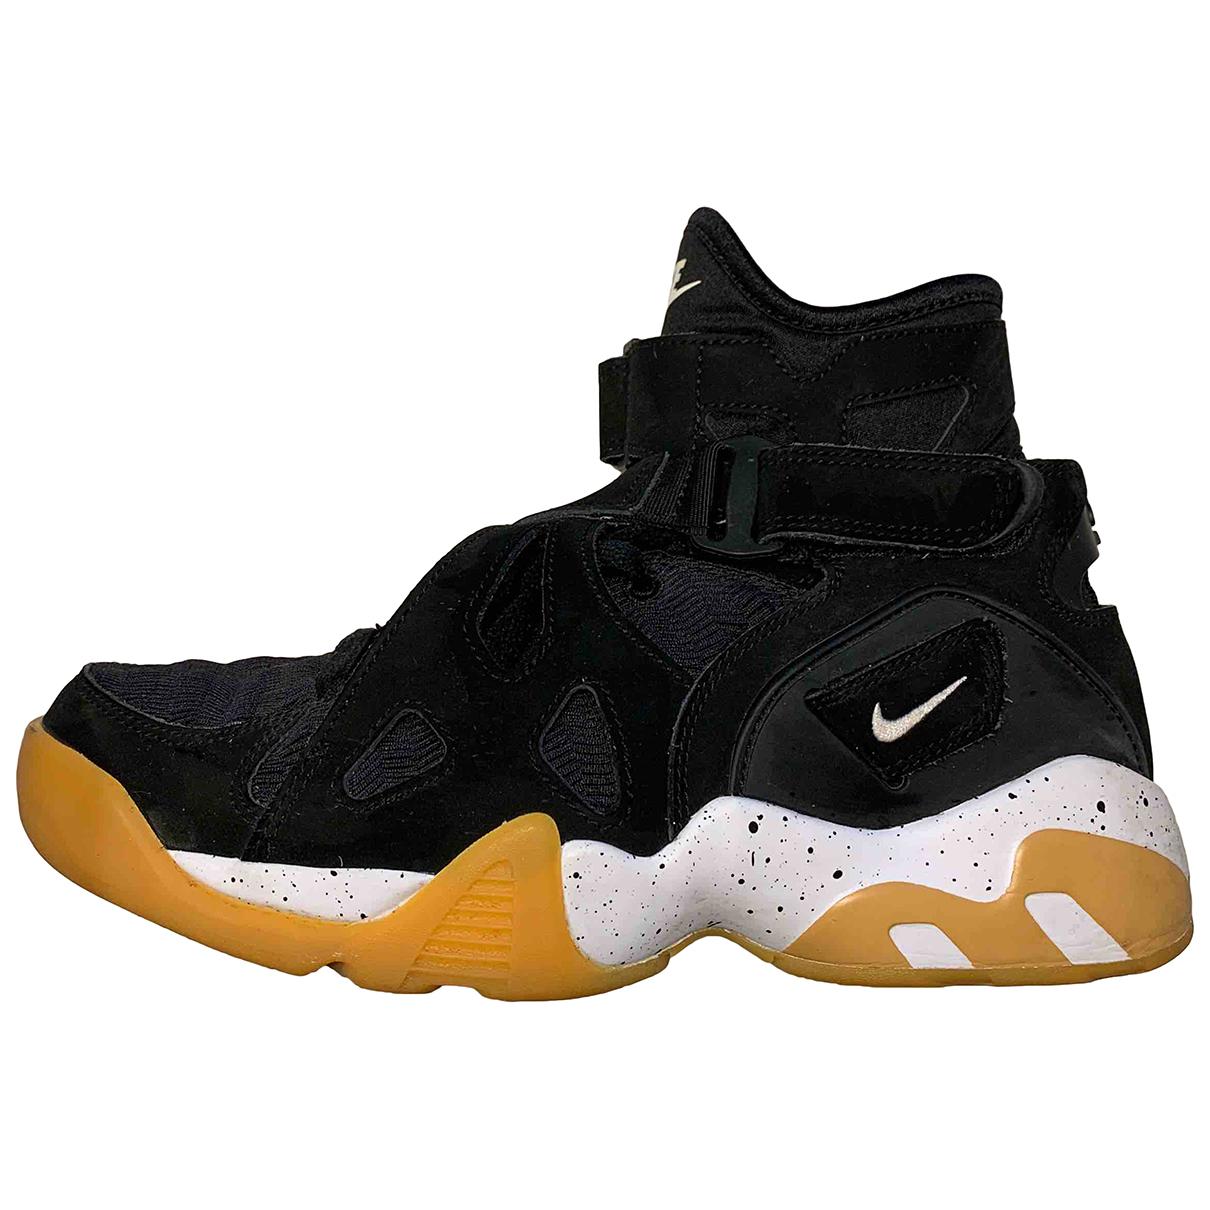 Nike \N Black Suede Trainers for Women 38.5 EU